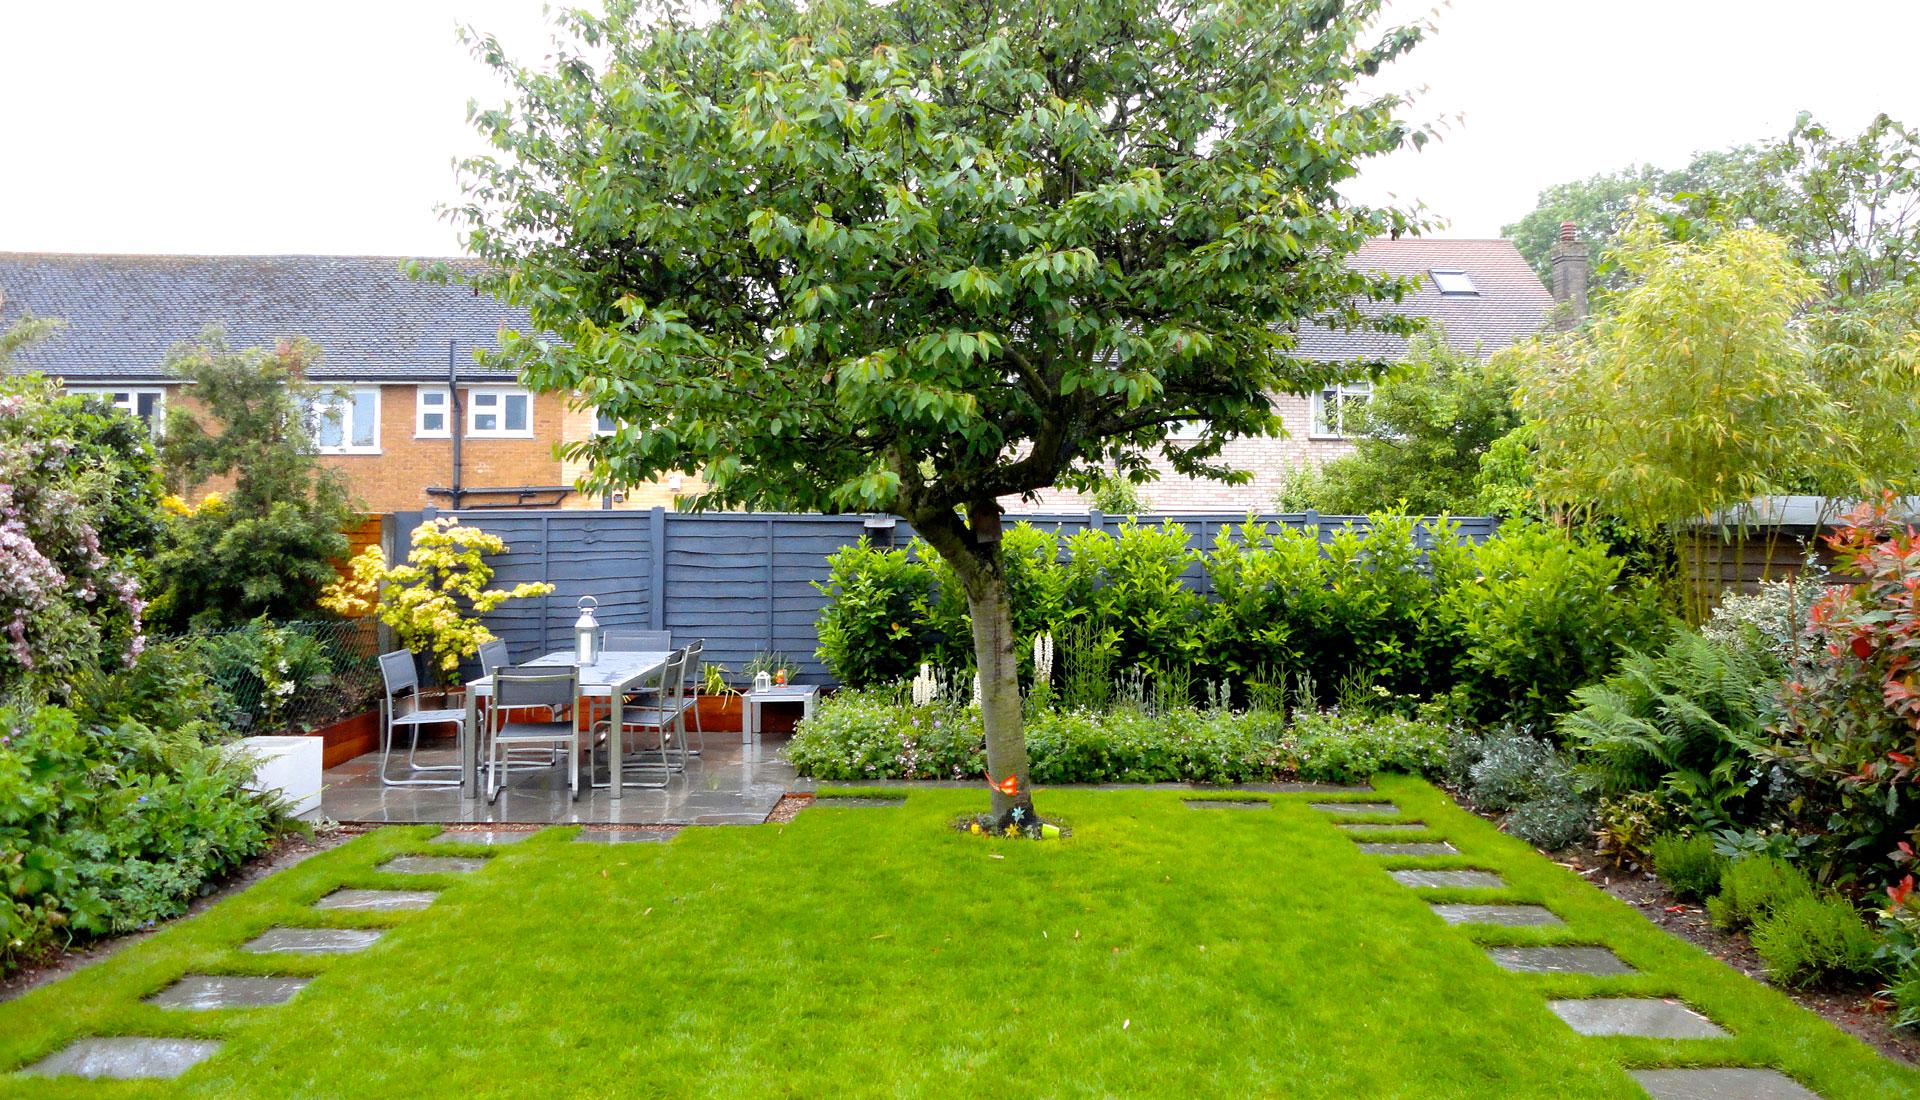 Designs For Small Square Old Fashioned Gardens